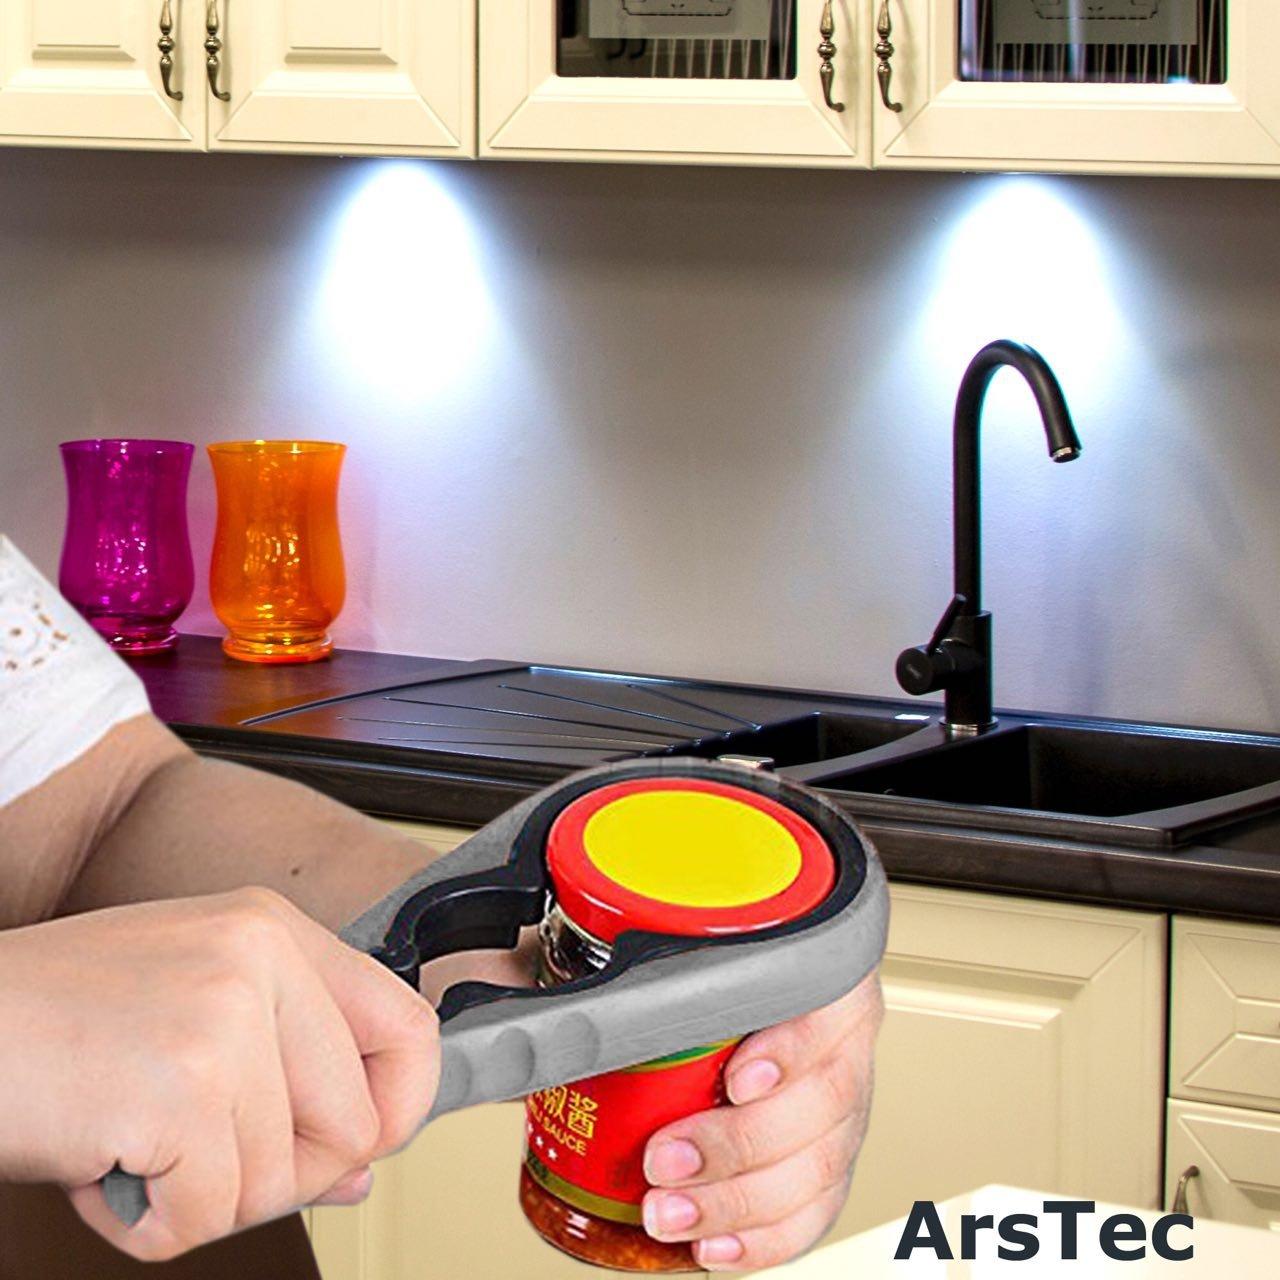 Arstec Jar Bottle Opener Non Slip Jar Gripper Pad - Rubber Jar Can Lid Opener for Weak, Senior, Arthritis Hands (Gray) by ArsTec (Image #4)